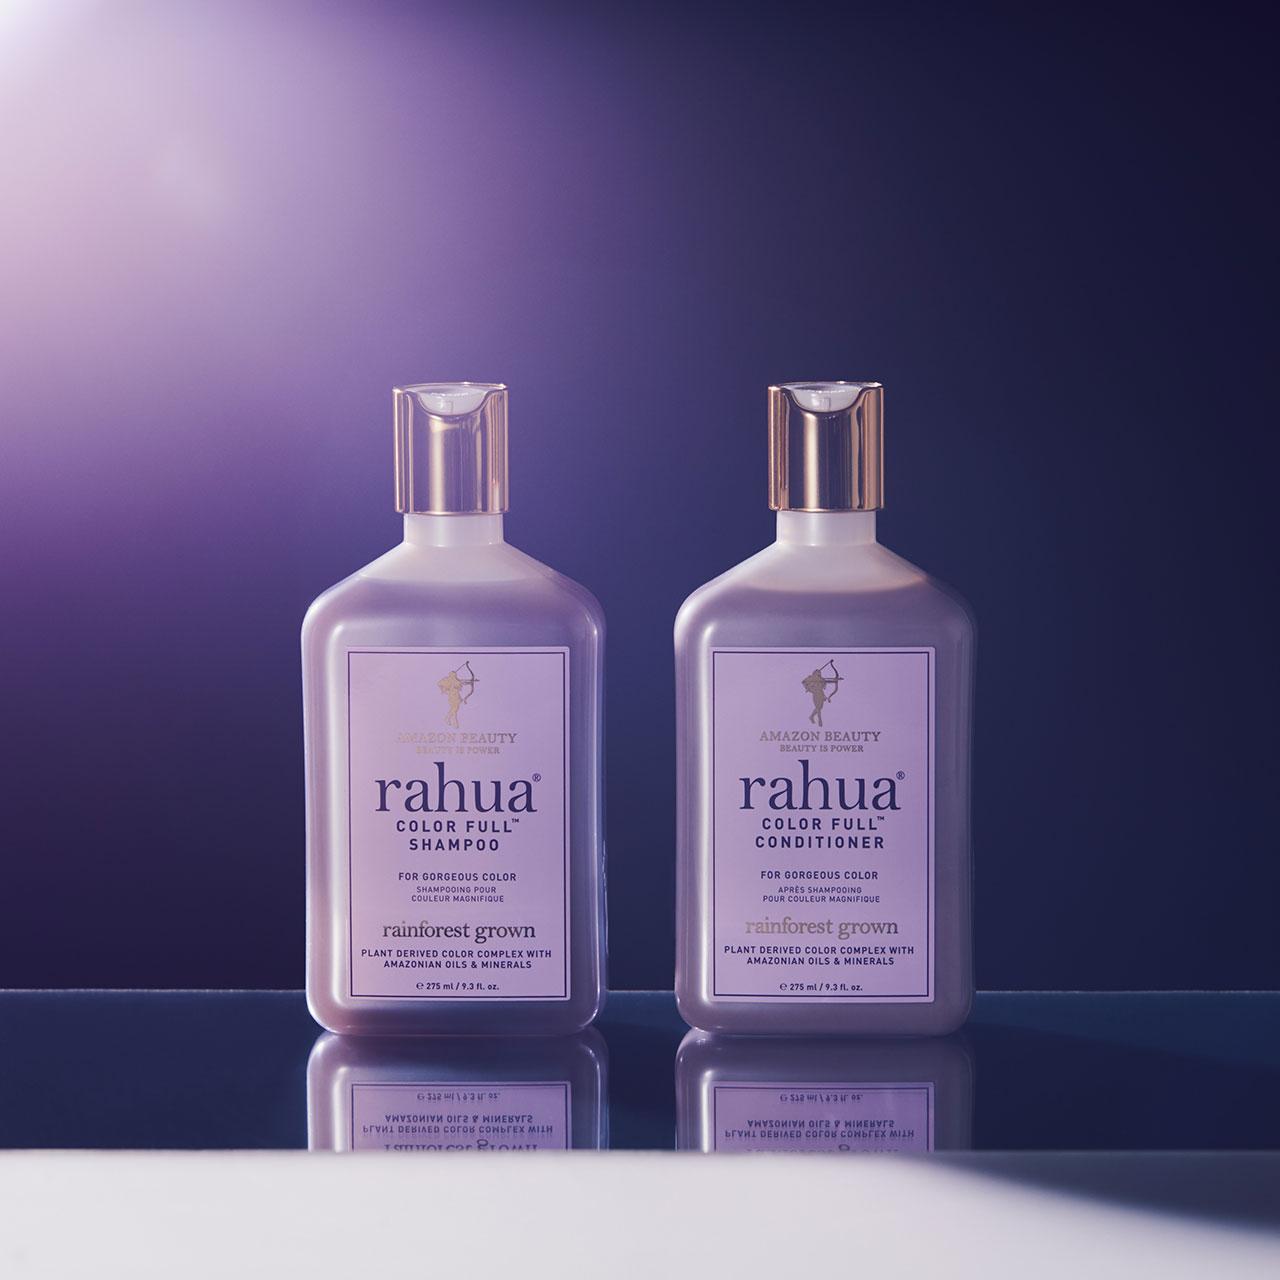 rahua CFシャンプー 275㎖ ¥5,500、同コンディショナー 275㎖ ¥5,700